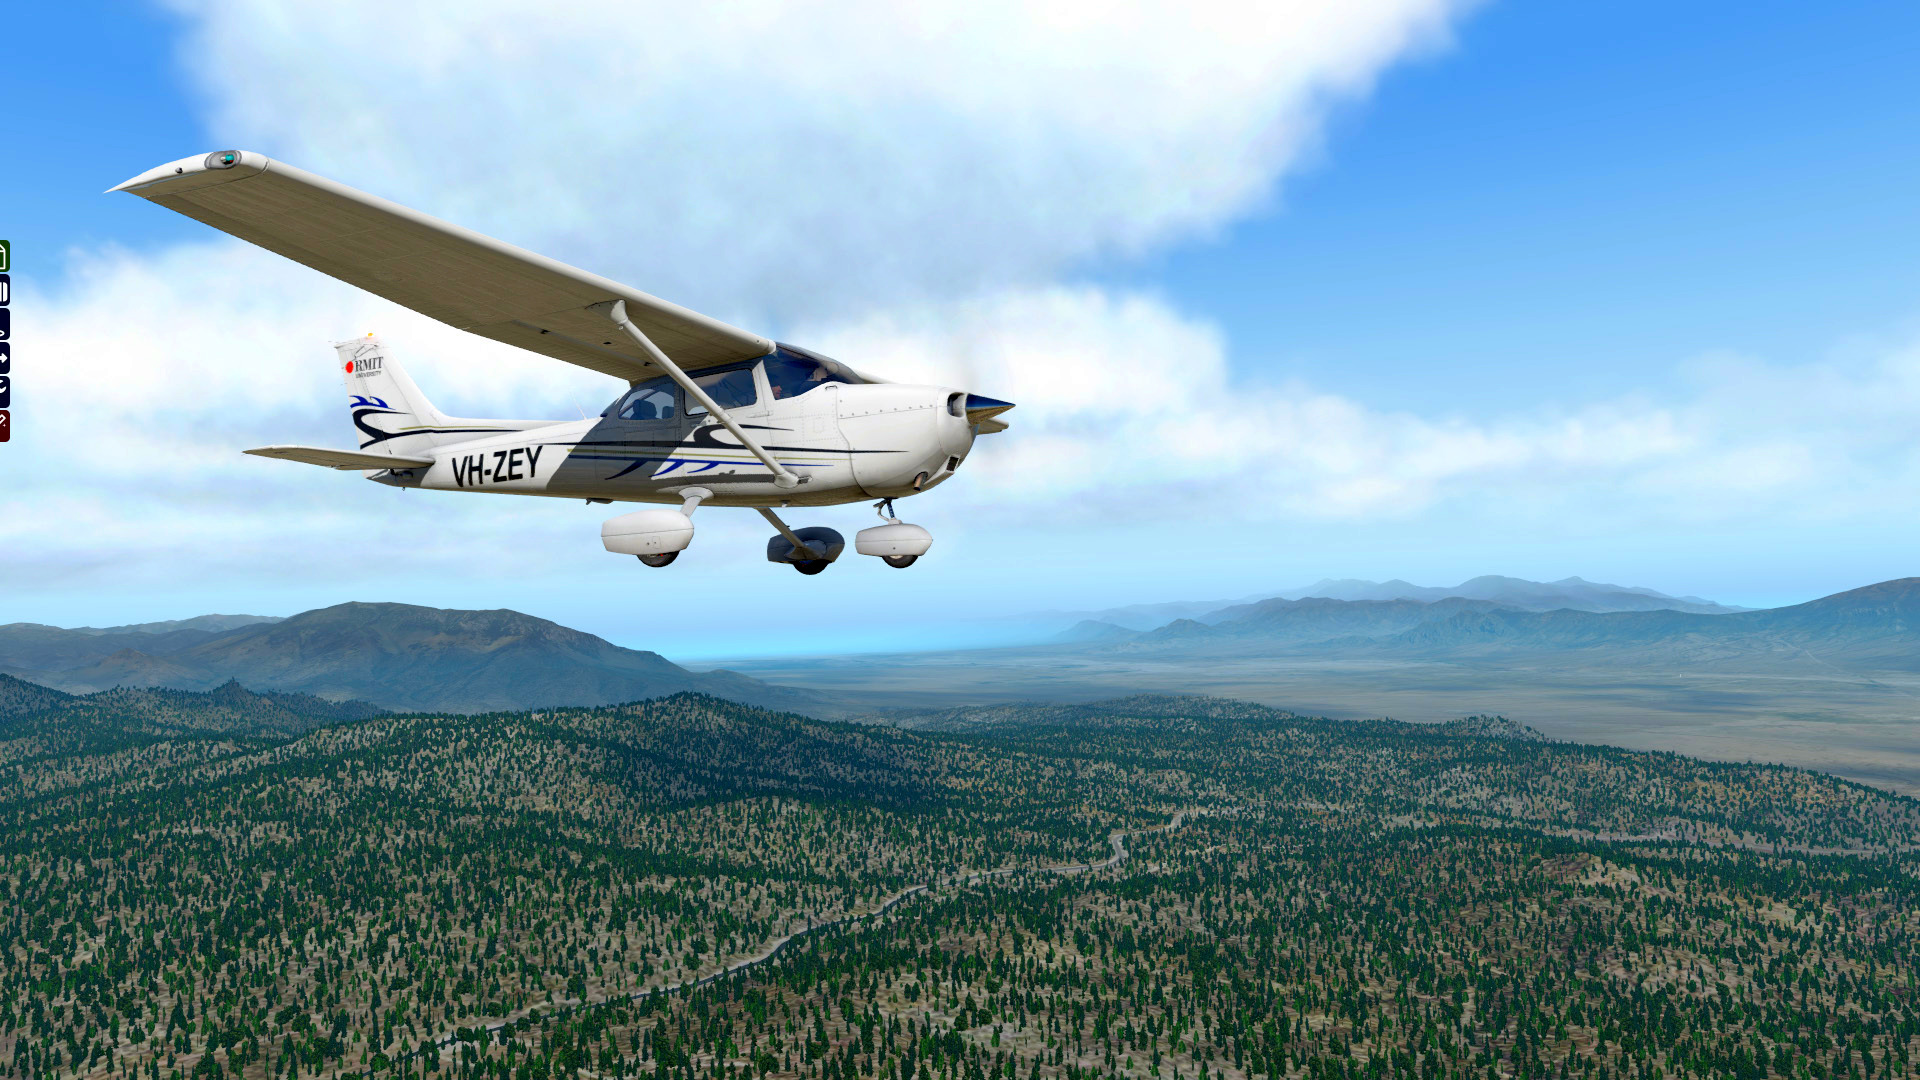 Pilote-Virtuel com - Forum de simulation aérienne / [X-Plane